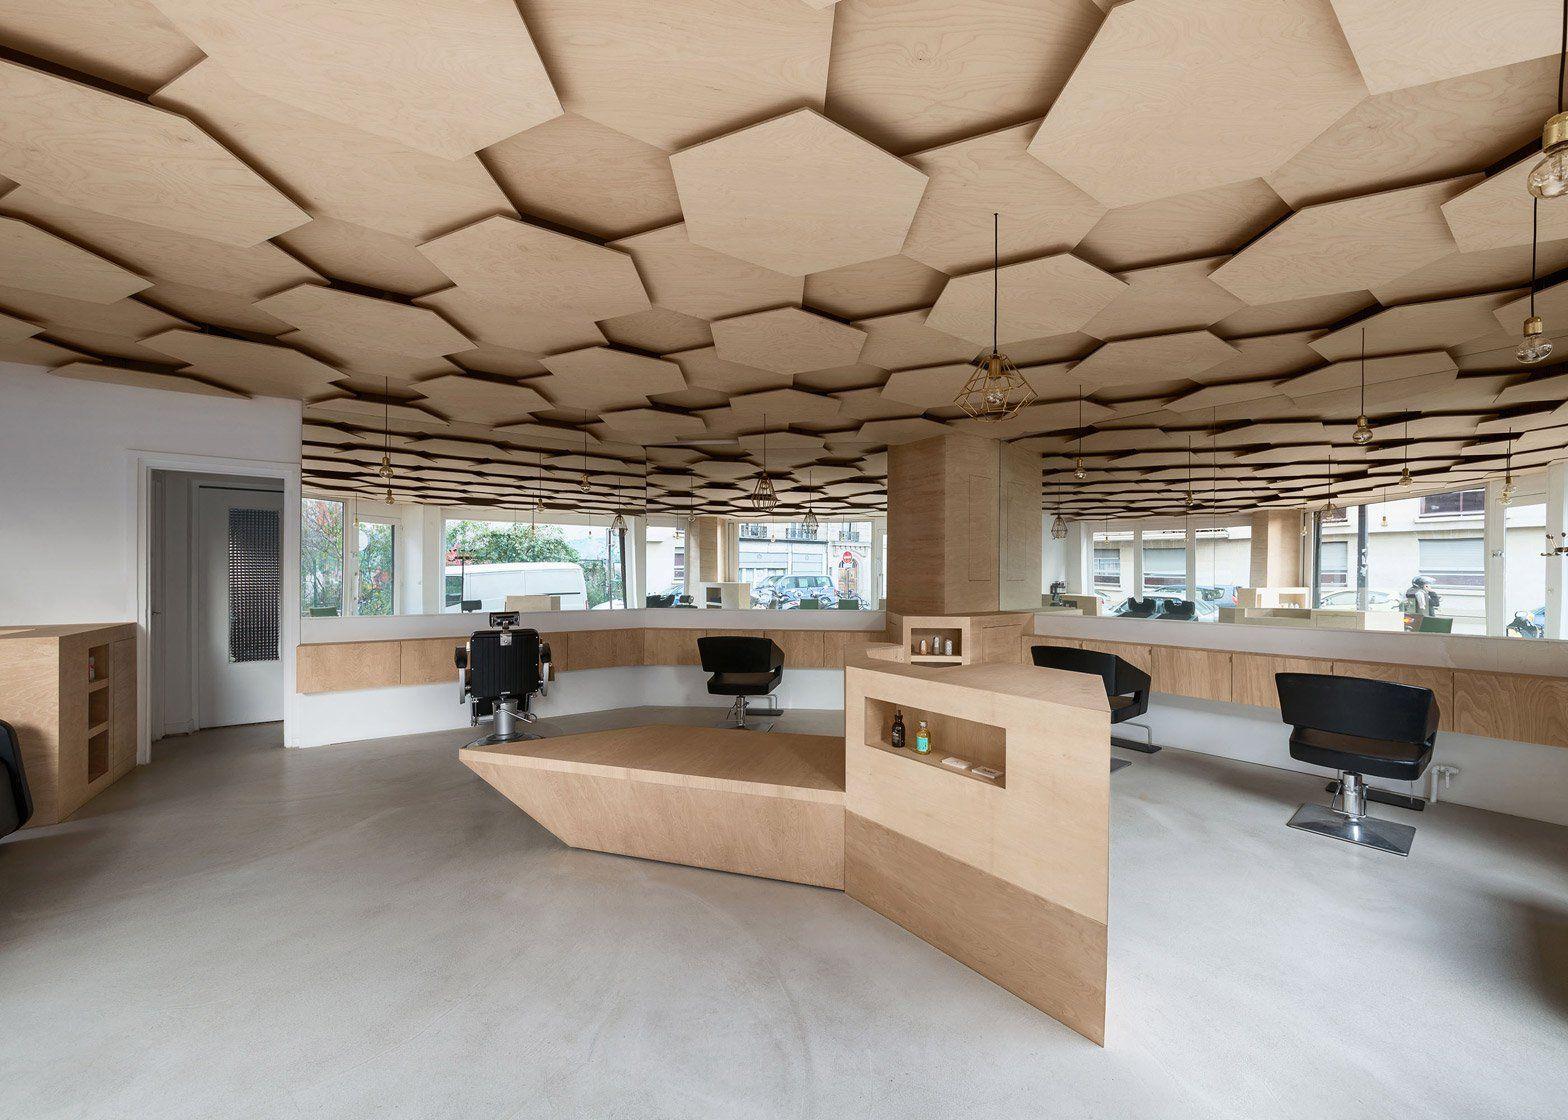 50+ Hexagon ceiling design ideas trends